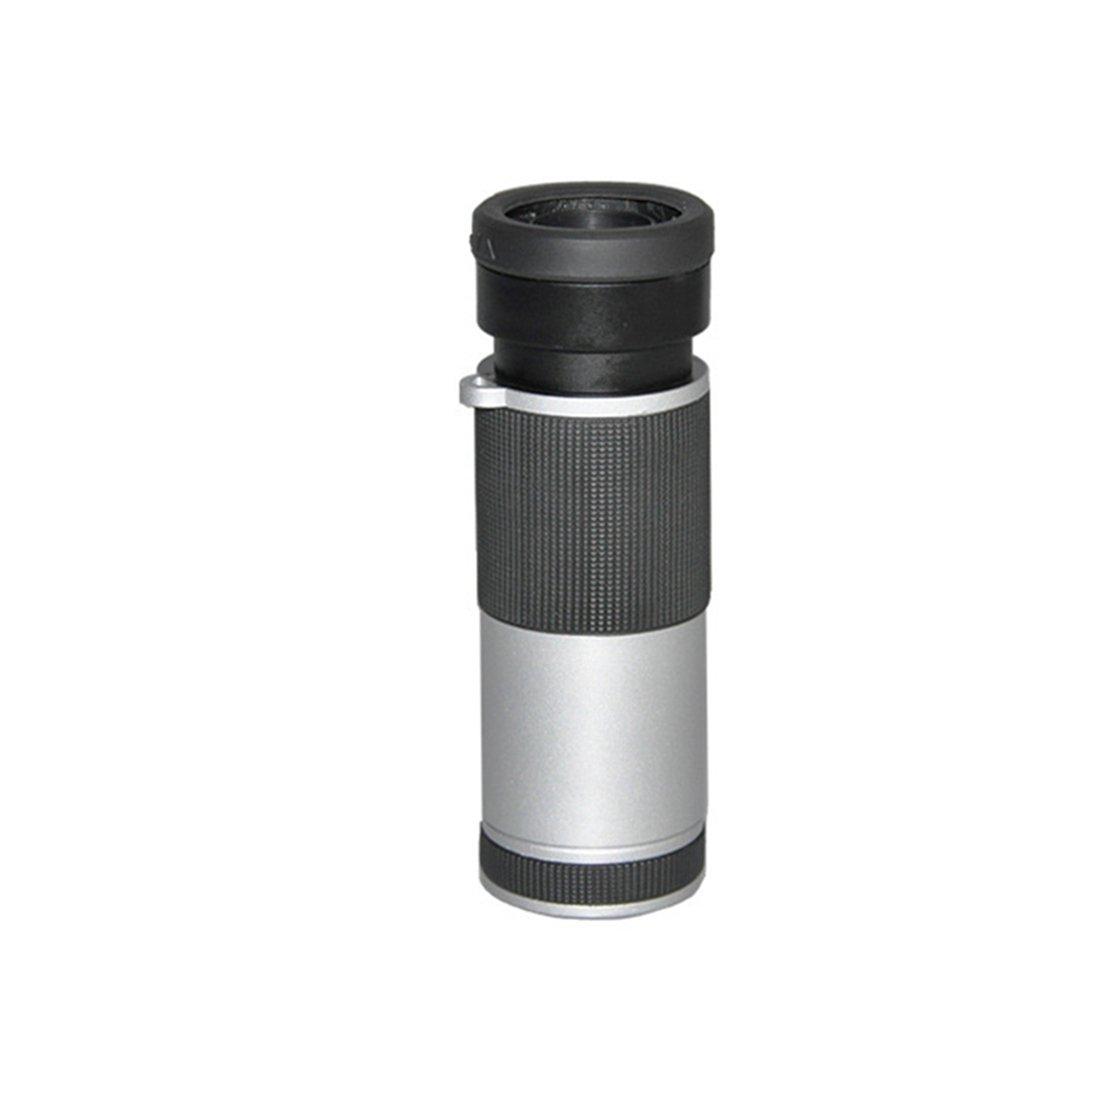 ZGQA-GQA Wide Angle Full Screen Single Tube Mobile Phone Telescope for Adult (Color : Black) by ZGQA-GQA